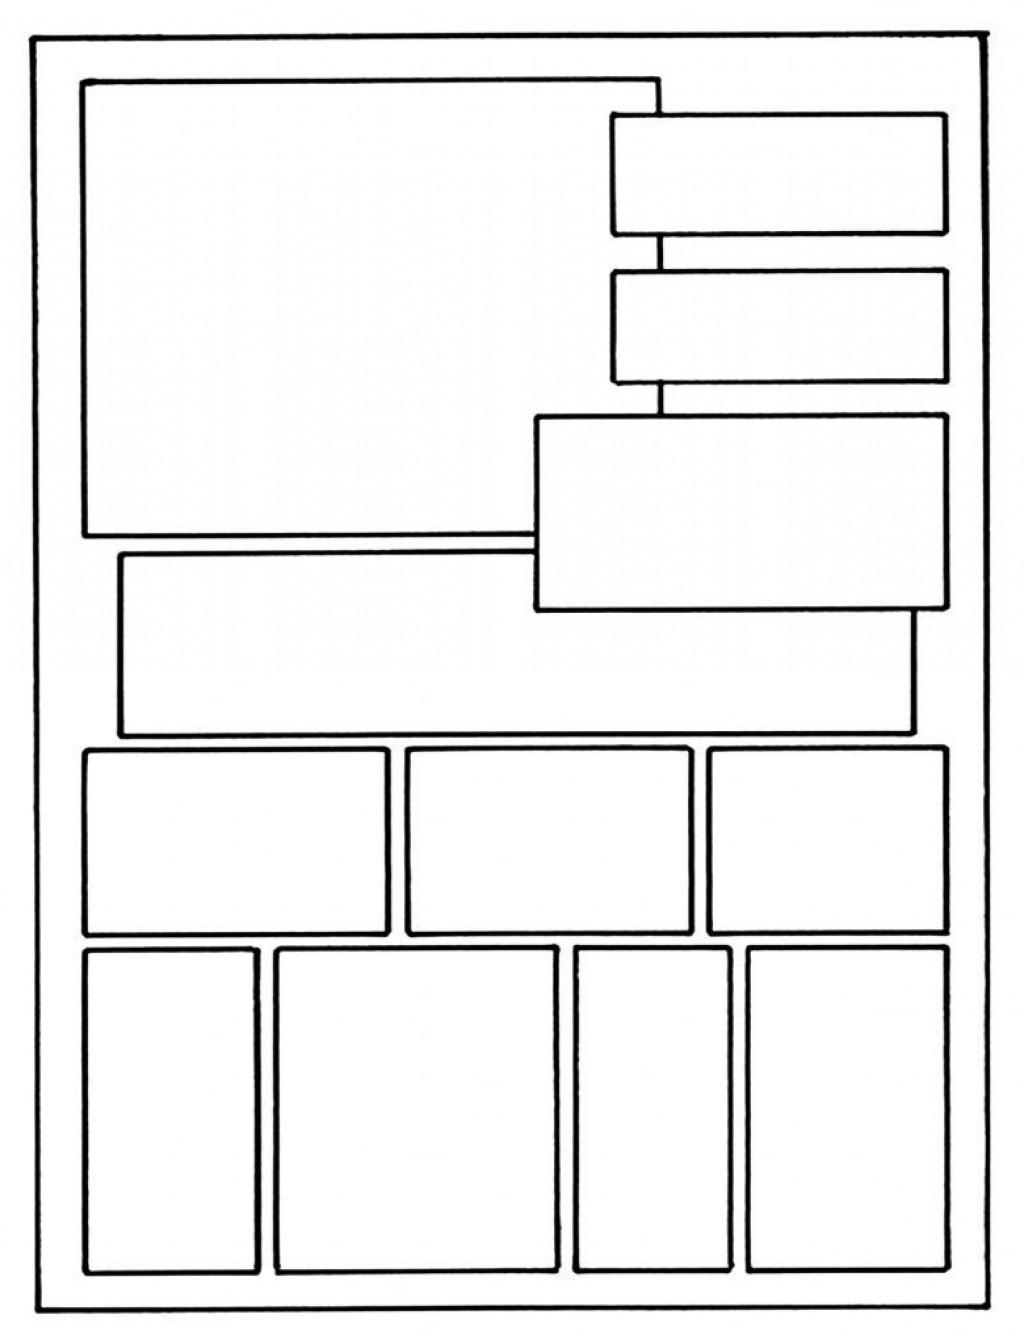 006 Fantastic Free Comic Strip Template Word Sample Large